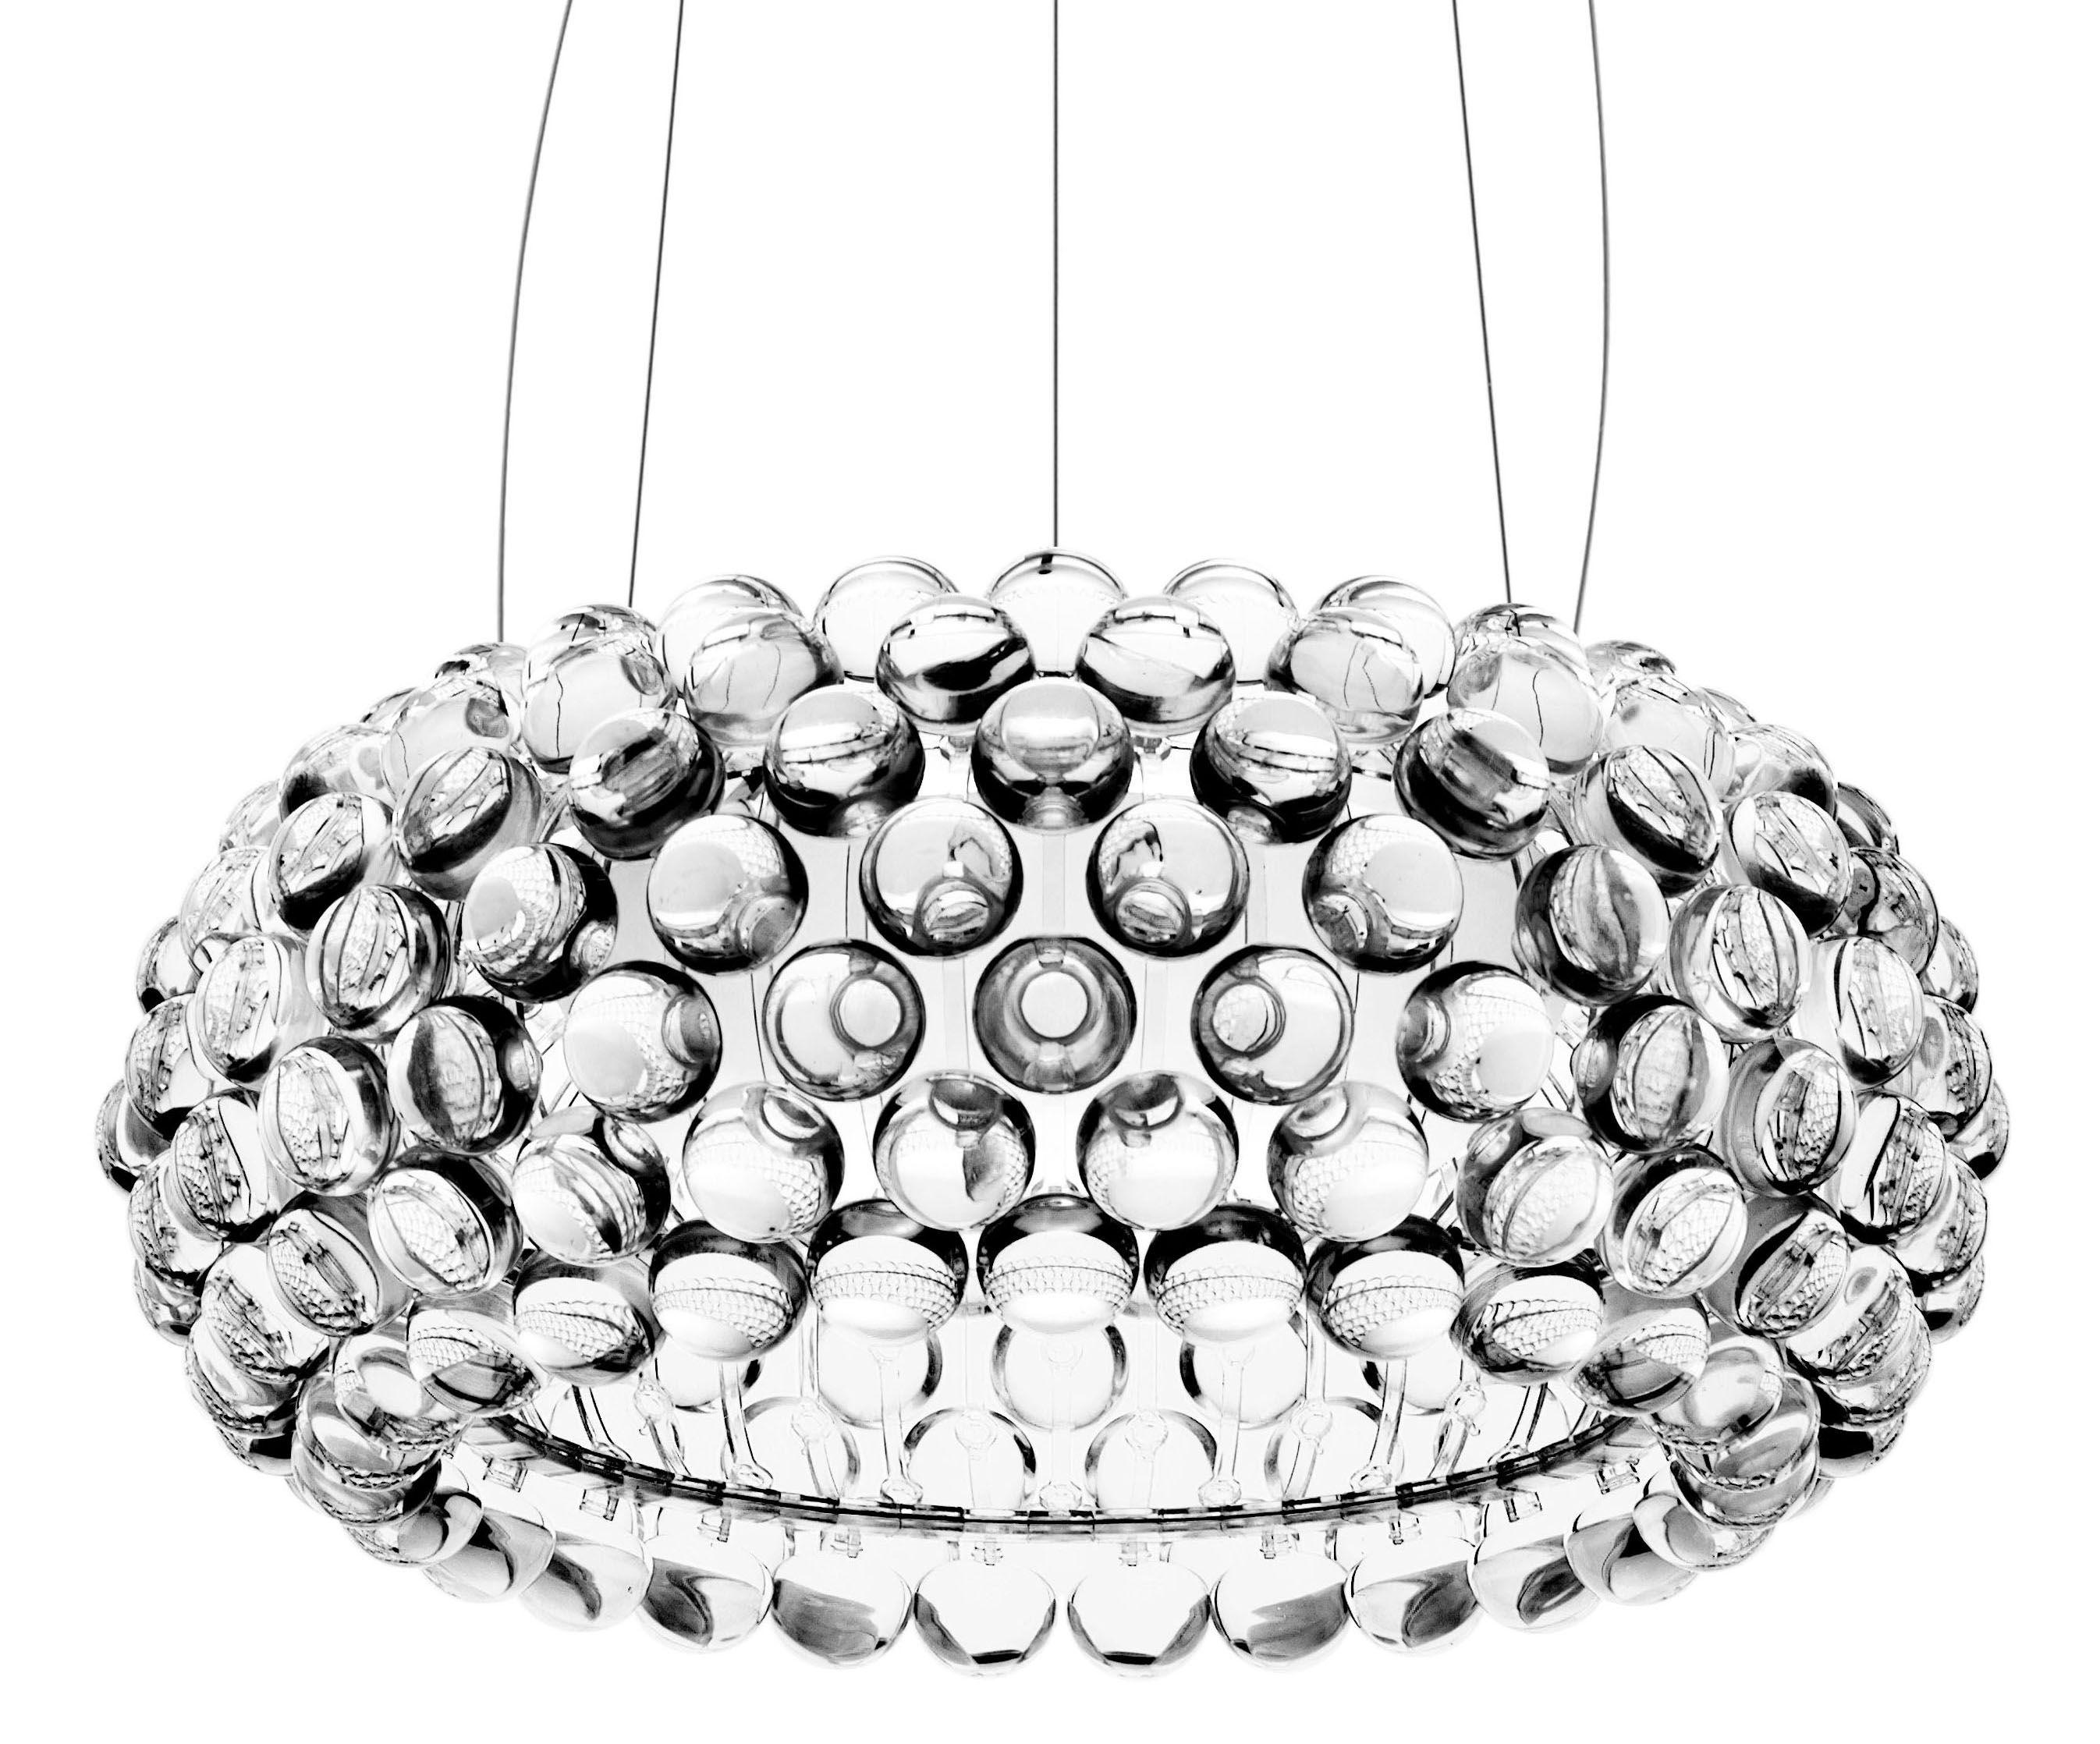 Luminaire - Suspensions - Suspension Caboche Media / Ø 50 cm - Foscarini - Transparent - PMMA